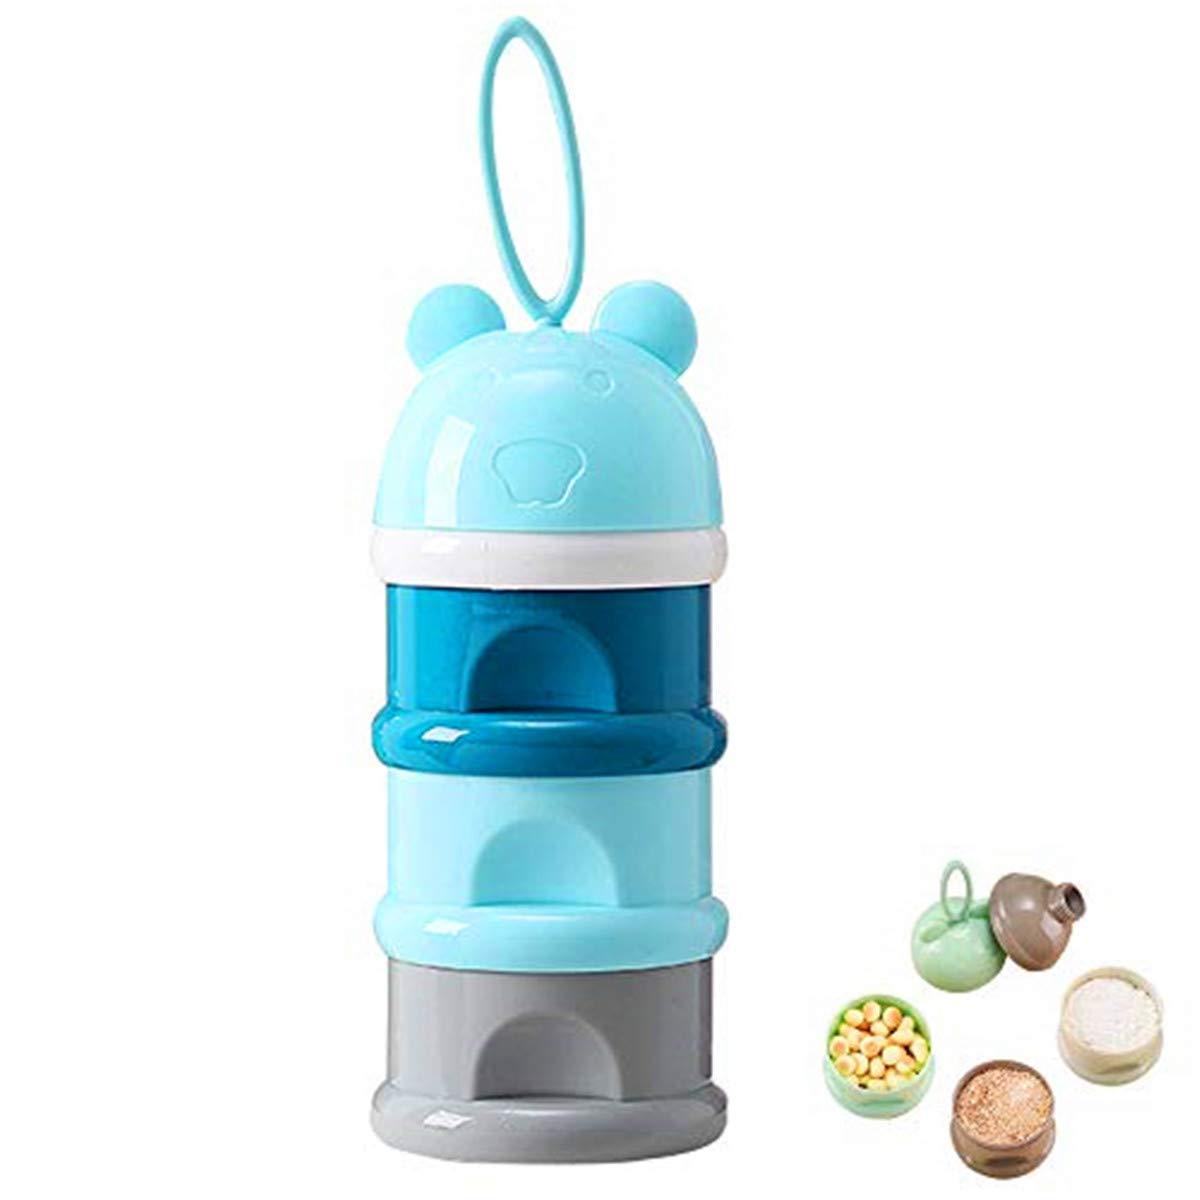 Baby Milk Powder Dispenser Stackable Baby Feeding Travel Container Storage 3Pack